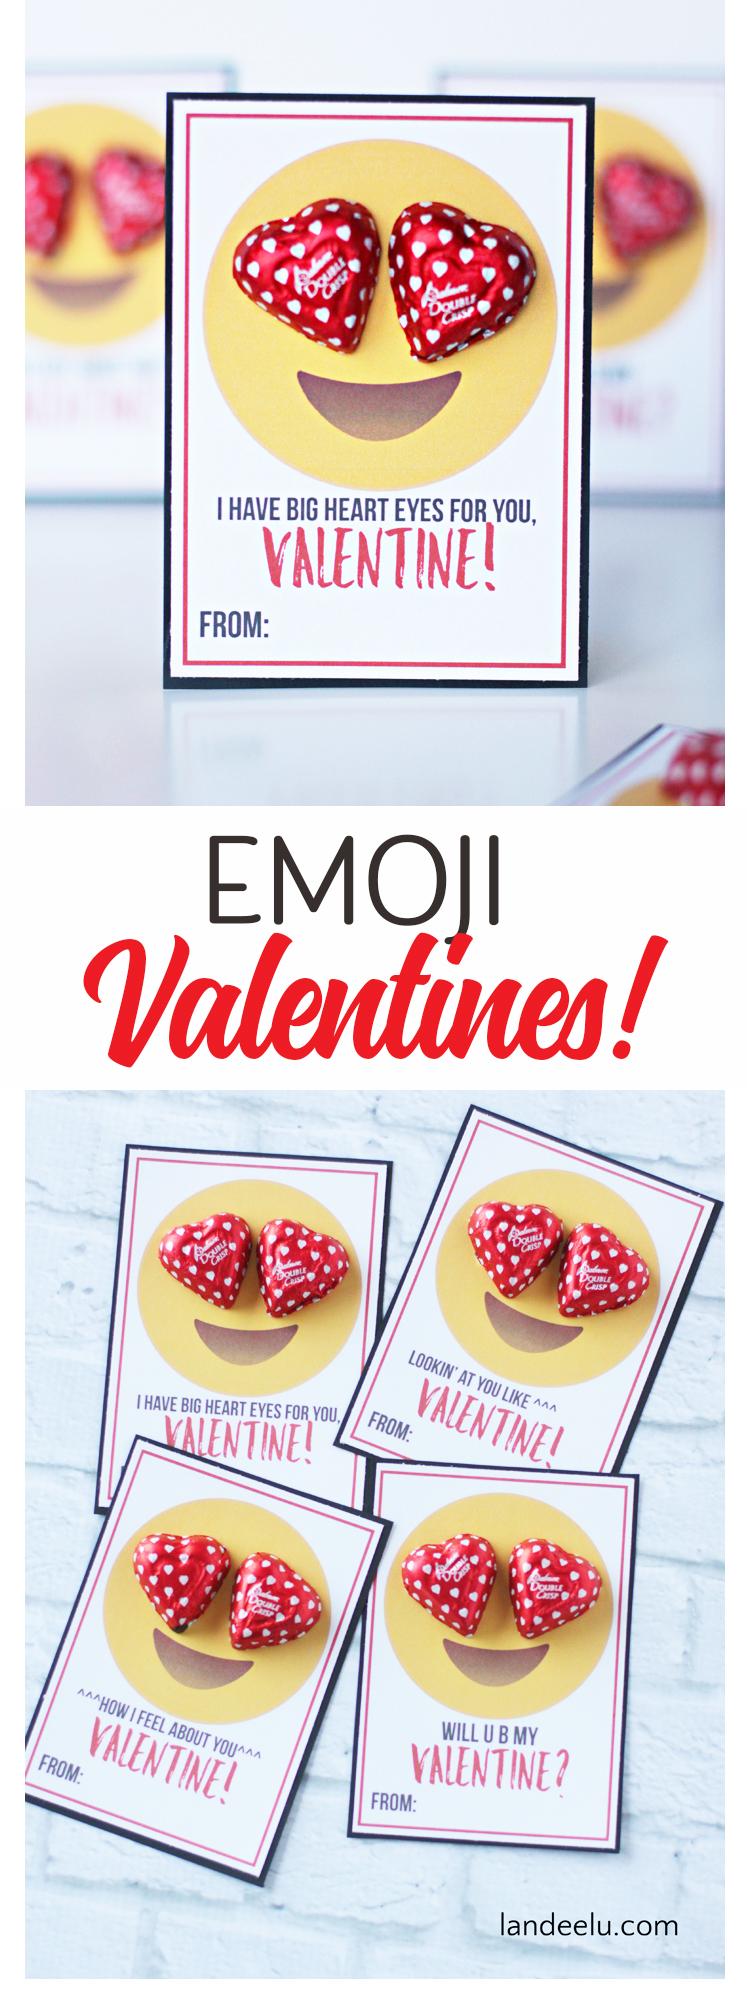 Emoji Printable Valentines - All the HEART EYES for these cute Emoji Printable Valentines! #valentinesday #valentineidea #easyvalentine #printablevalentine #freevalentine